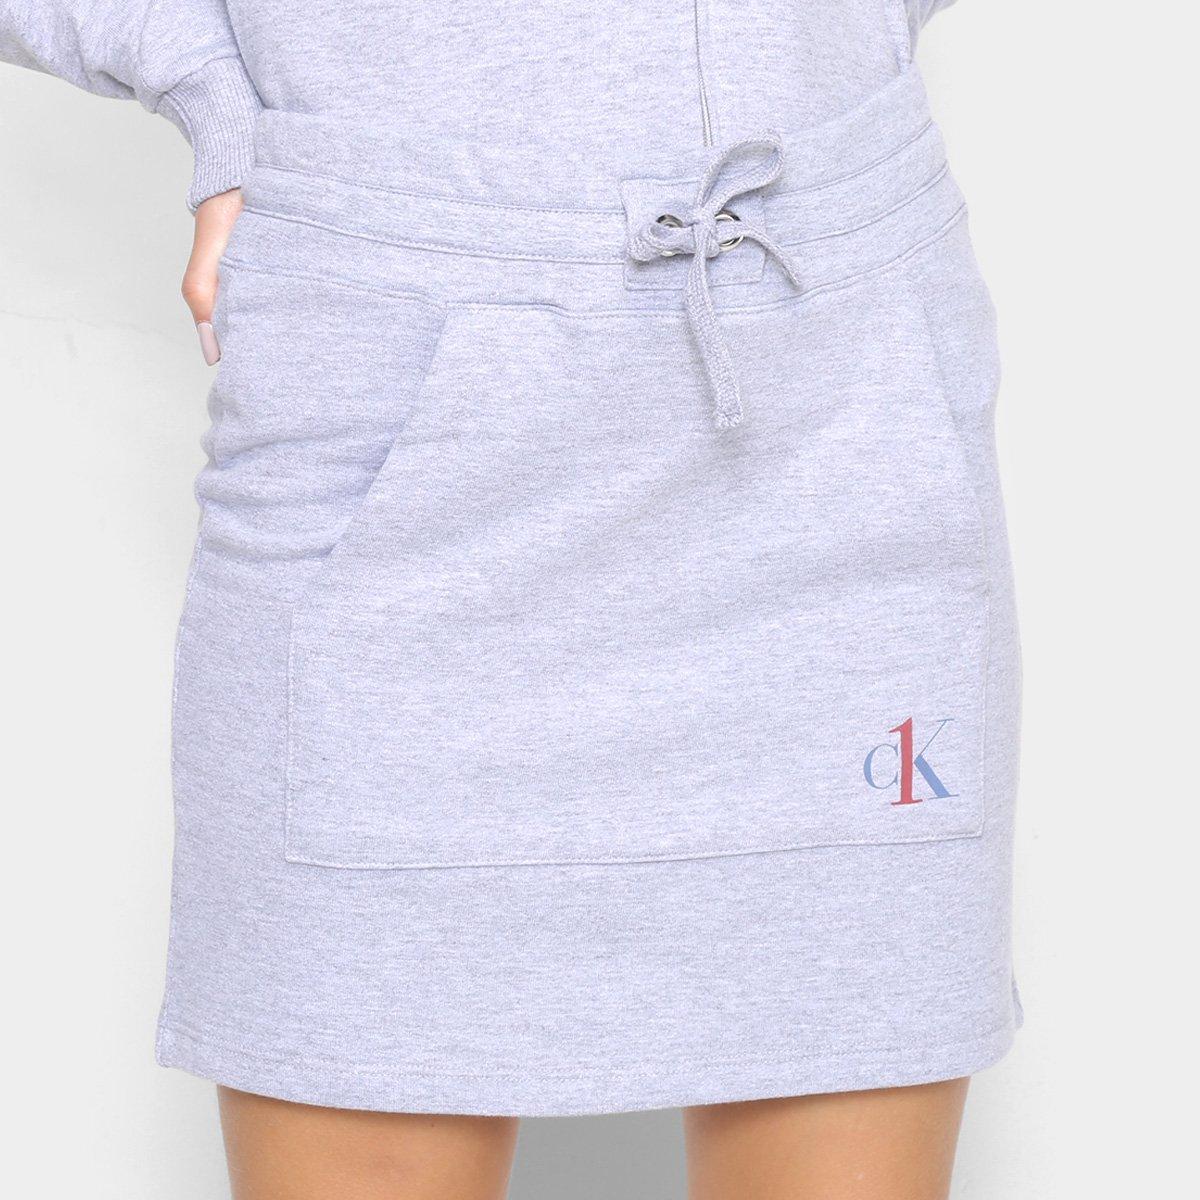 Saia Midi Moletom Calvin Klein Bolso Canguru Feminina